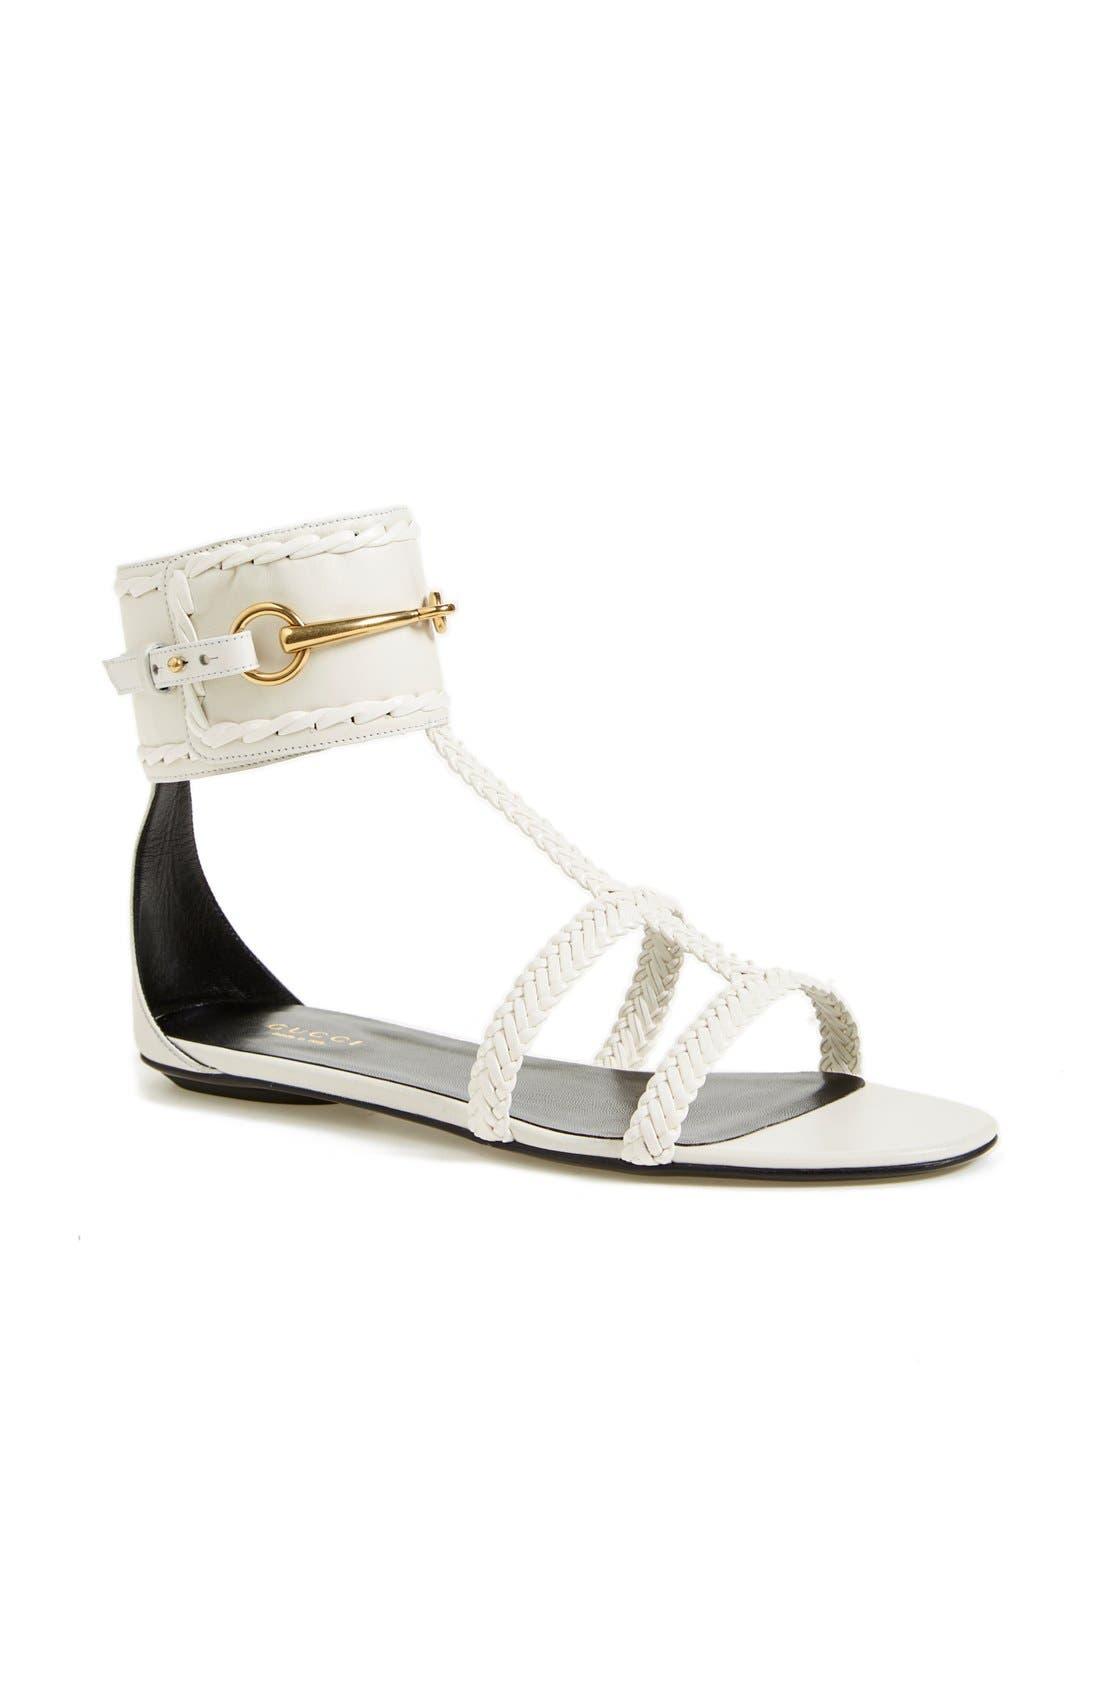 Alternate Image 1 Selected - Gucci 'Ursula' Braided Flat Sandal (Women)